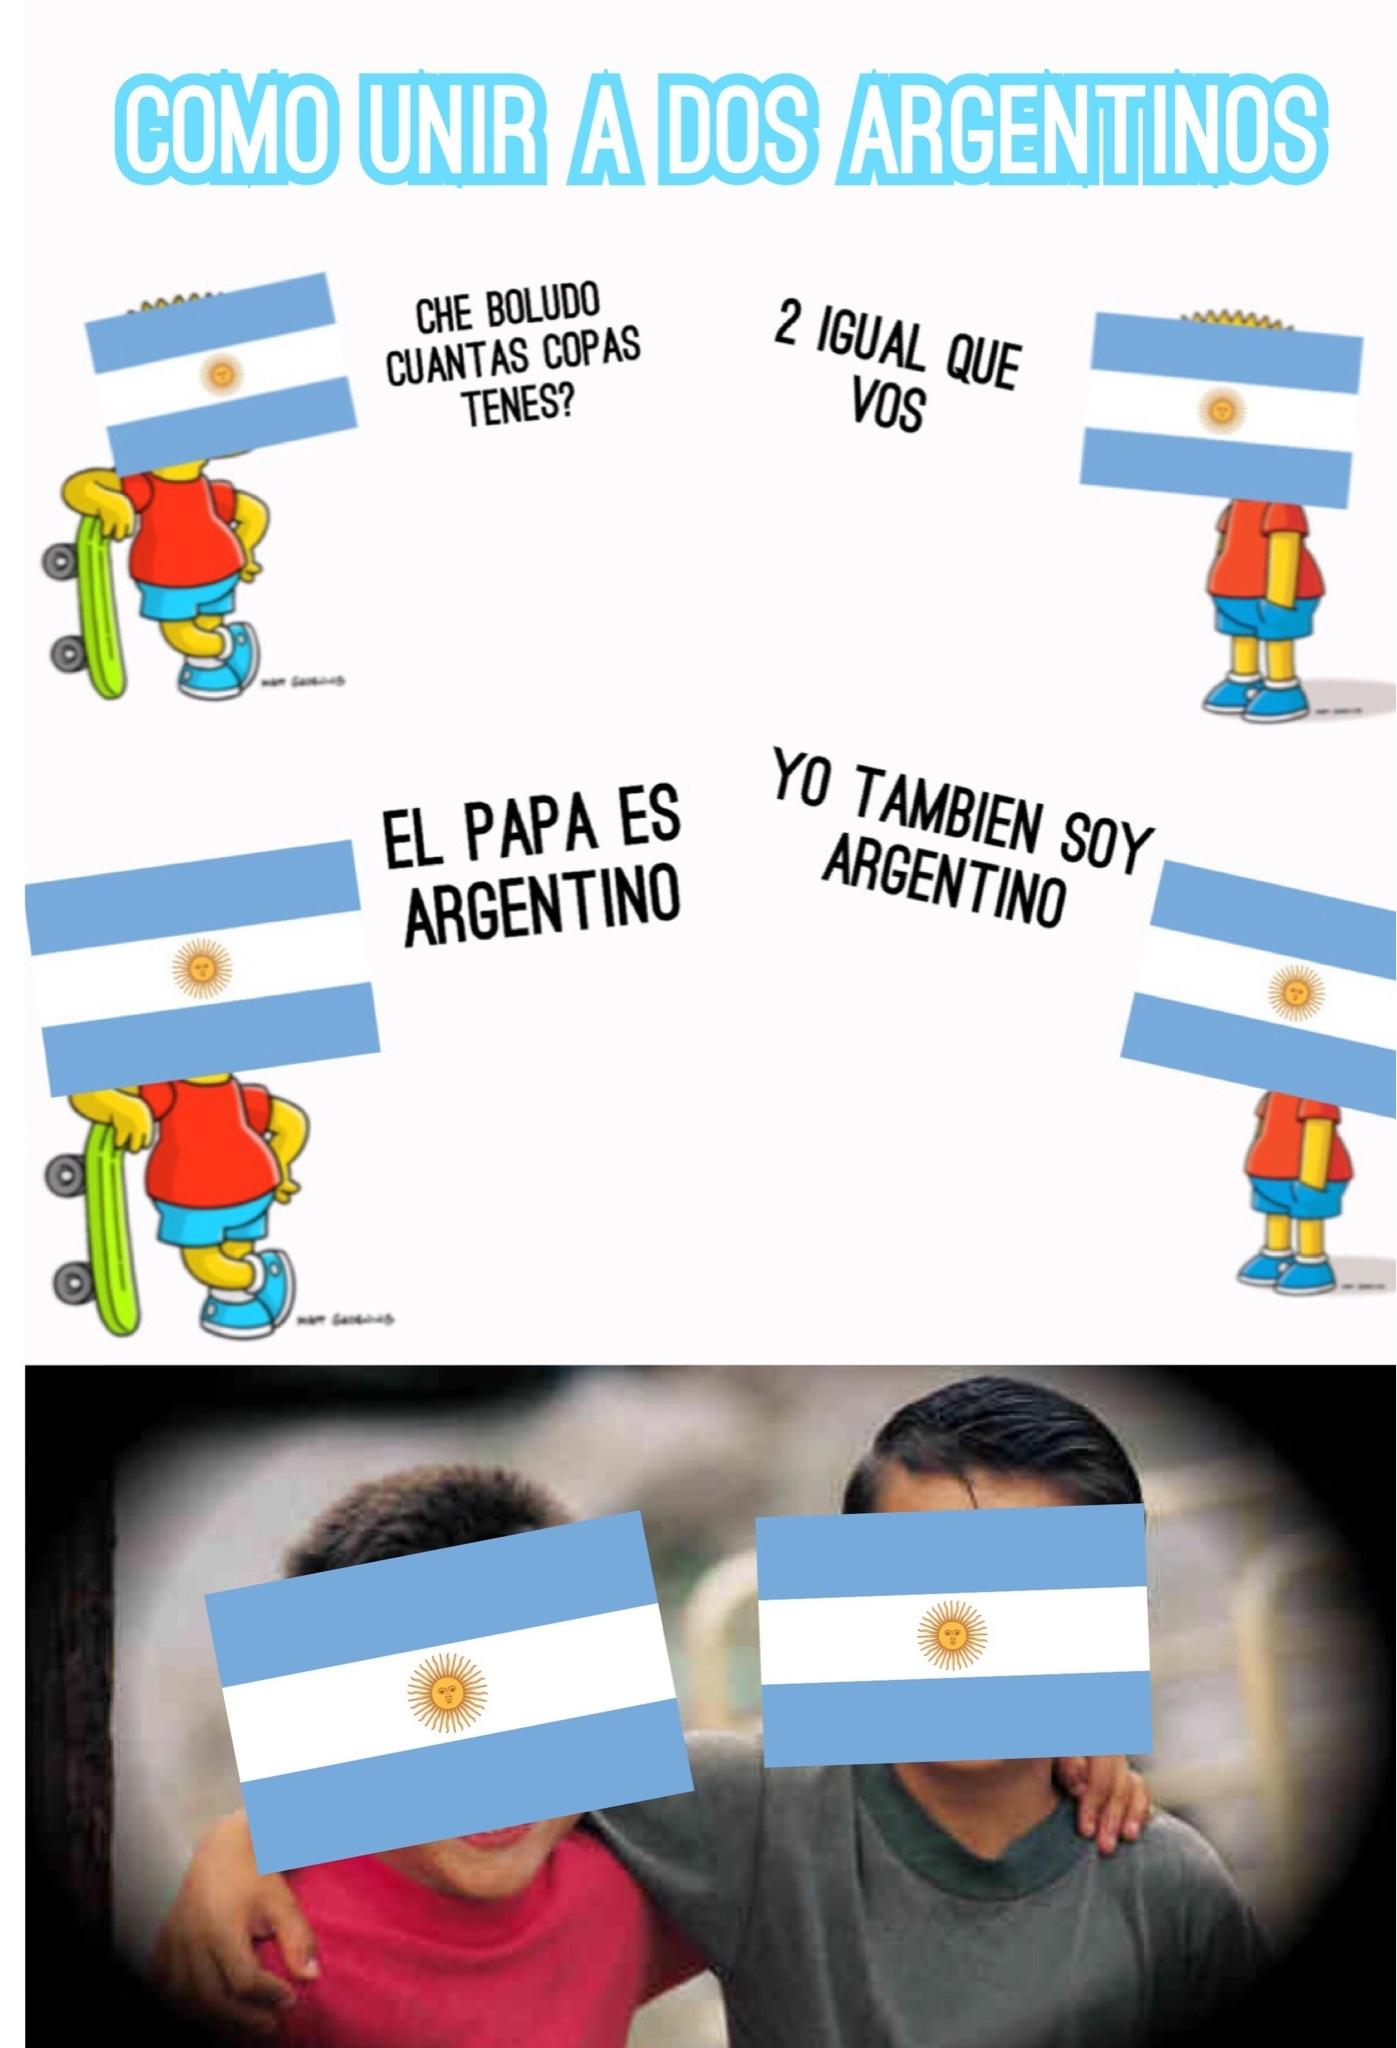 Como unir a dos Argentinos (SE REFIERE A 2 MUNDIALES) - meme